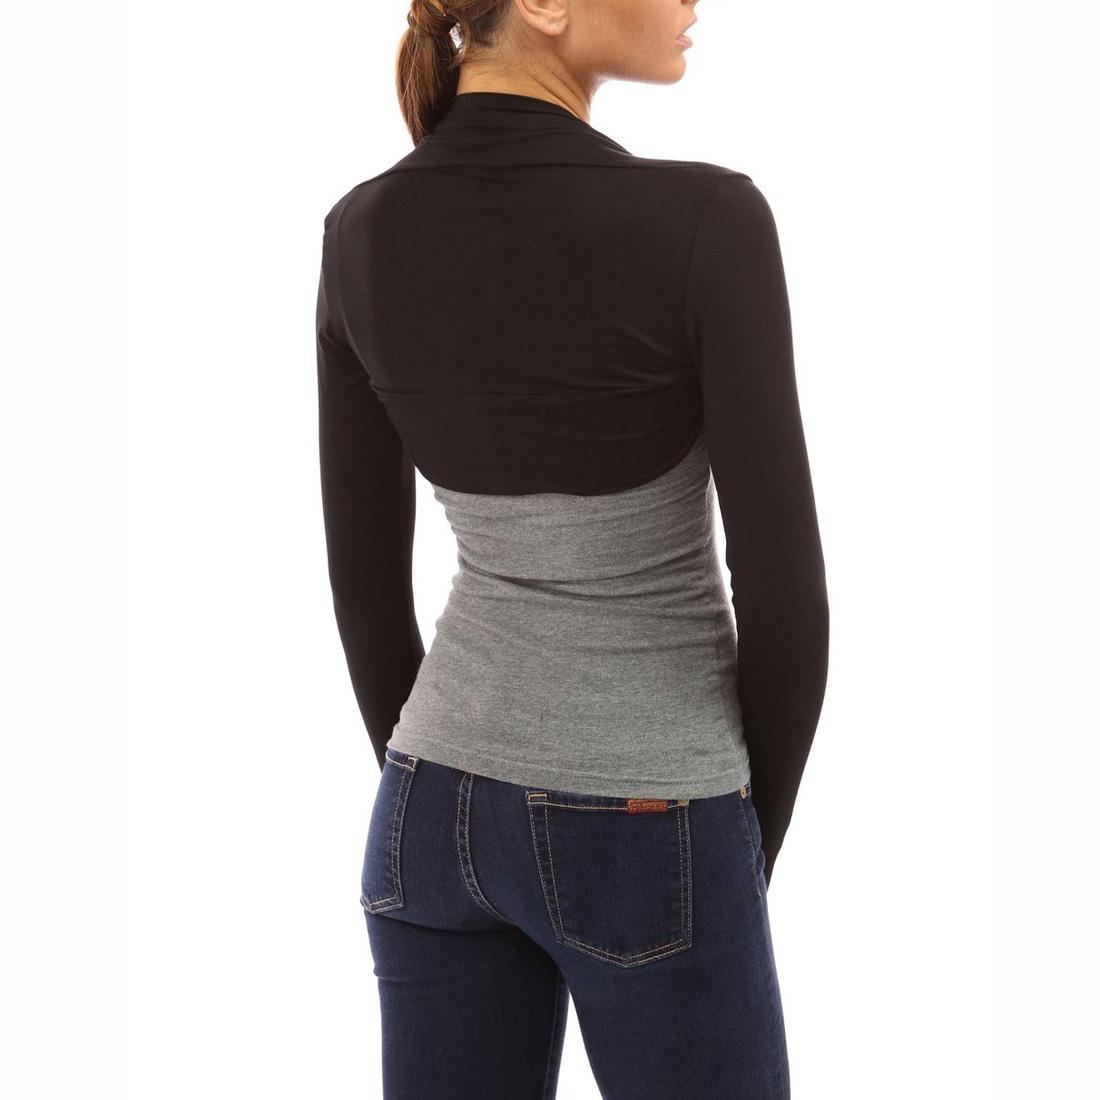 Womens cardigan sweater jacket